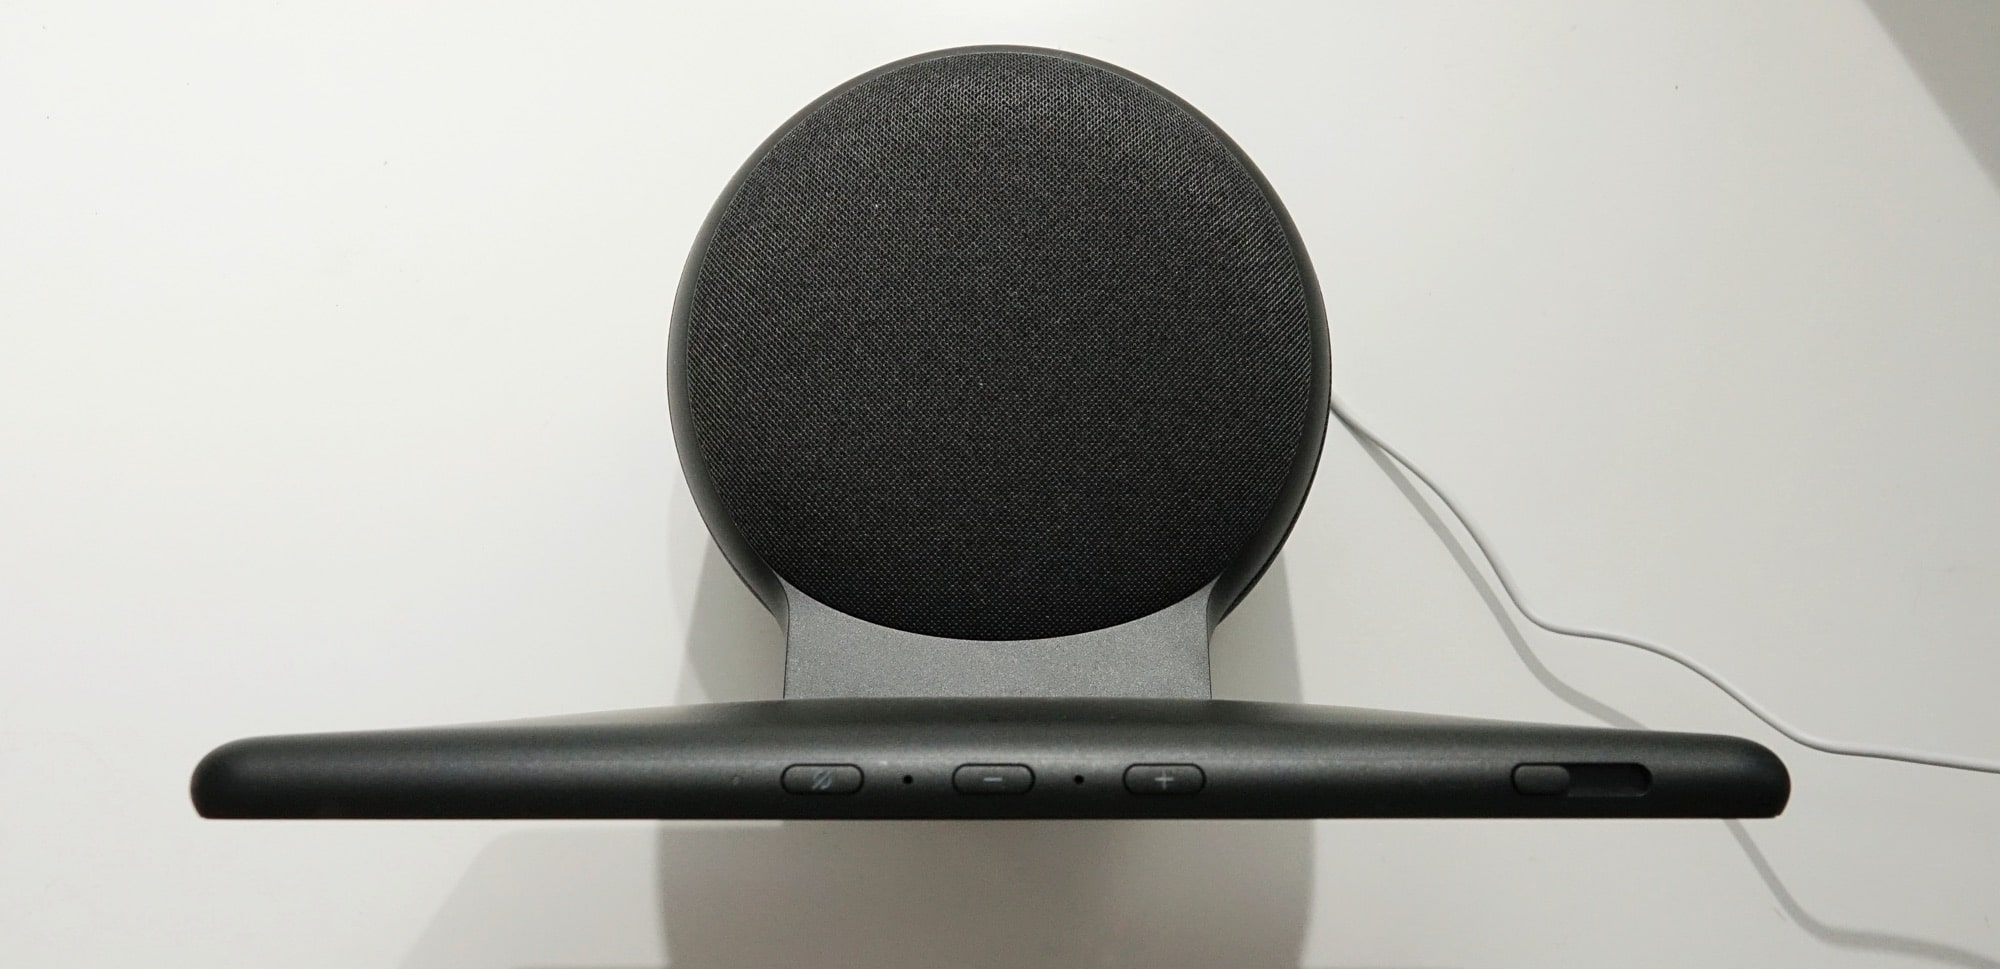 Amazon Echo Show 10 reviewed